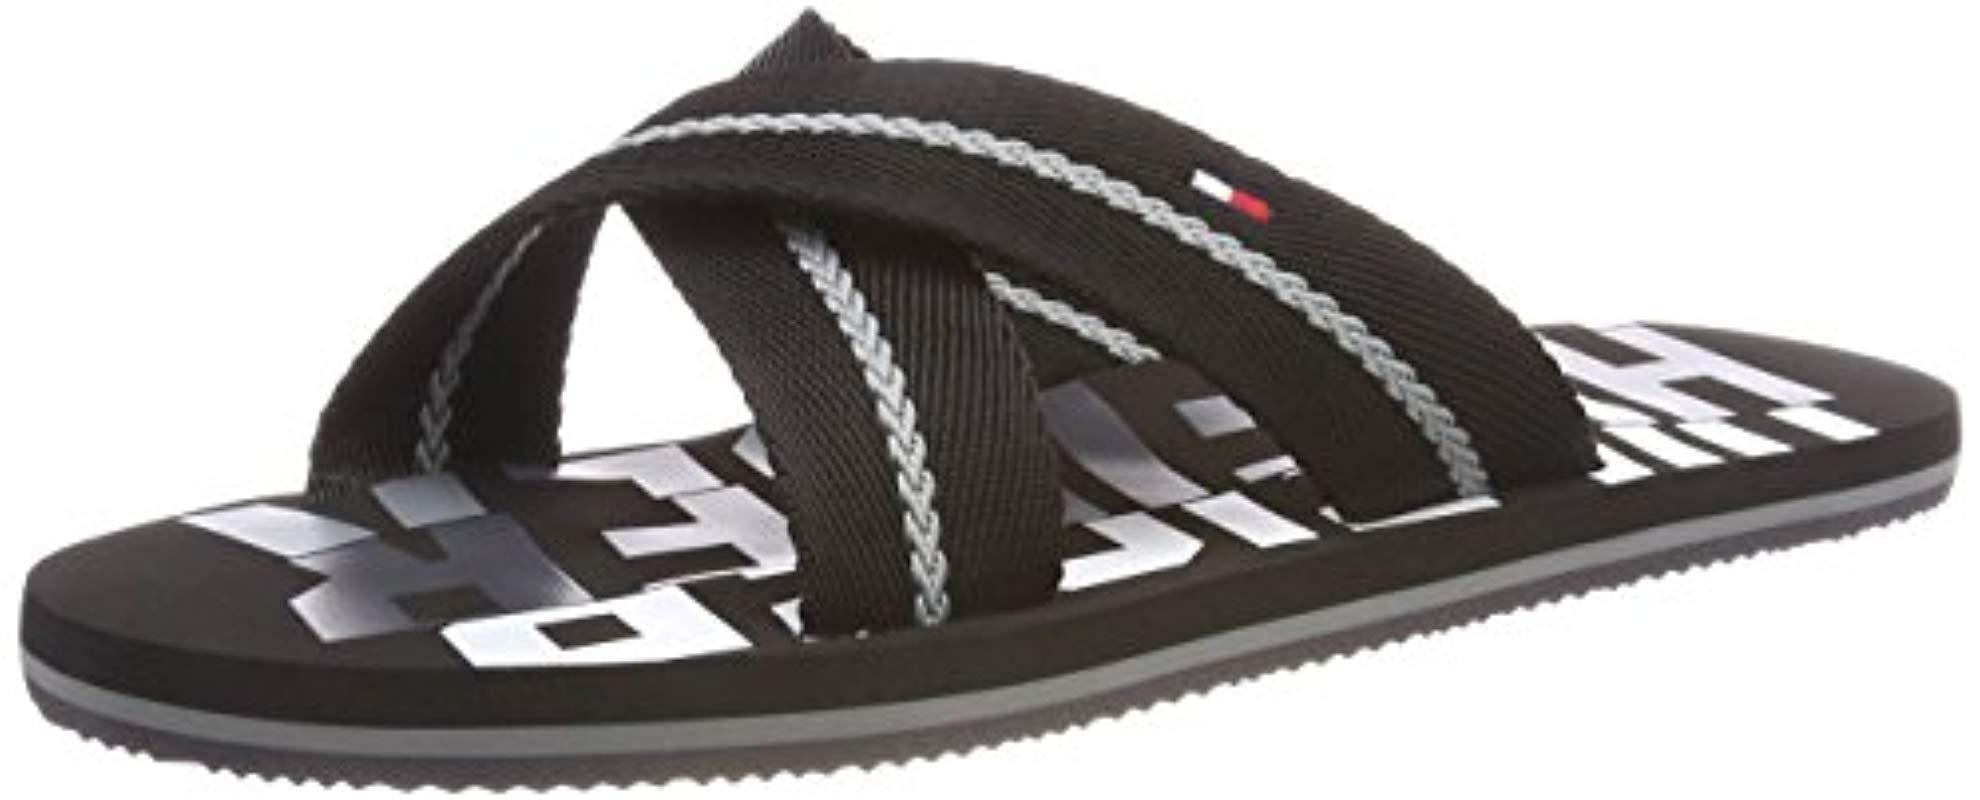 50a760069 Tommy Hilfiger - Black   s Bold Cross Beach Sandal Flip Flops for Men -